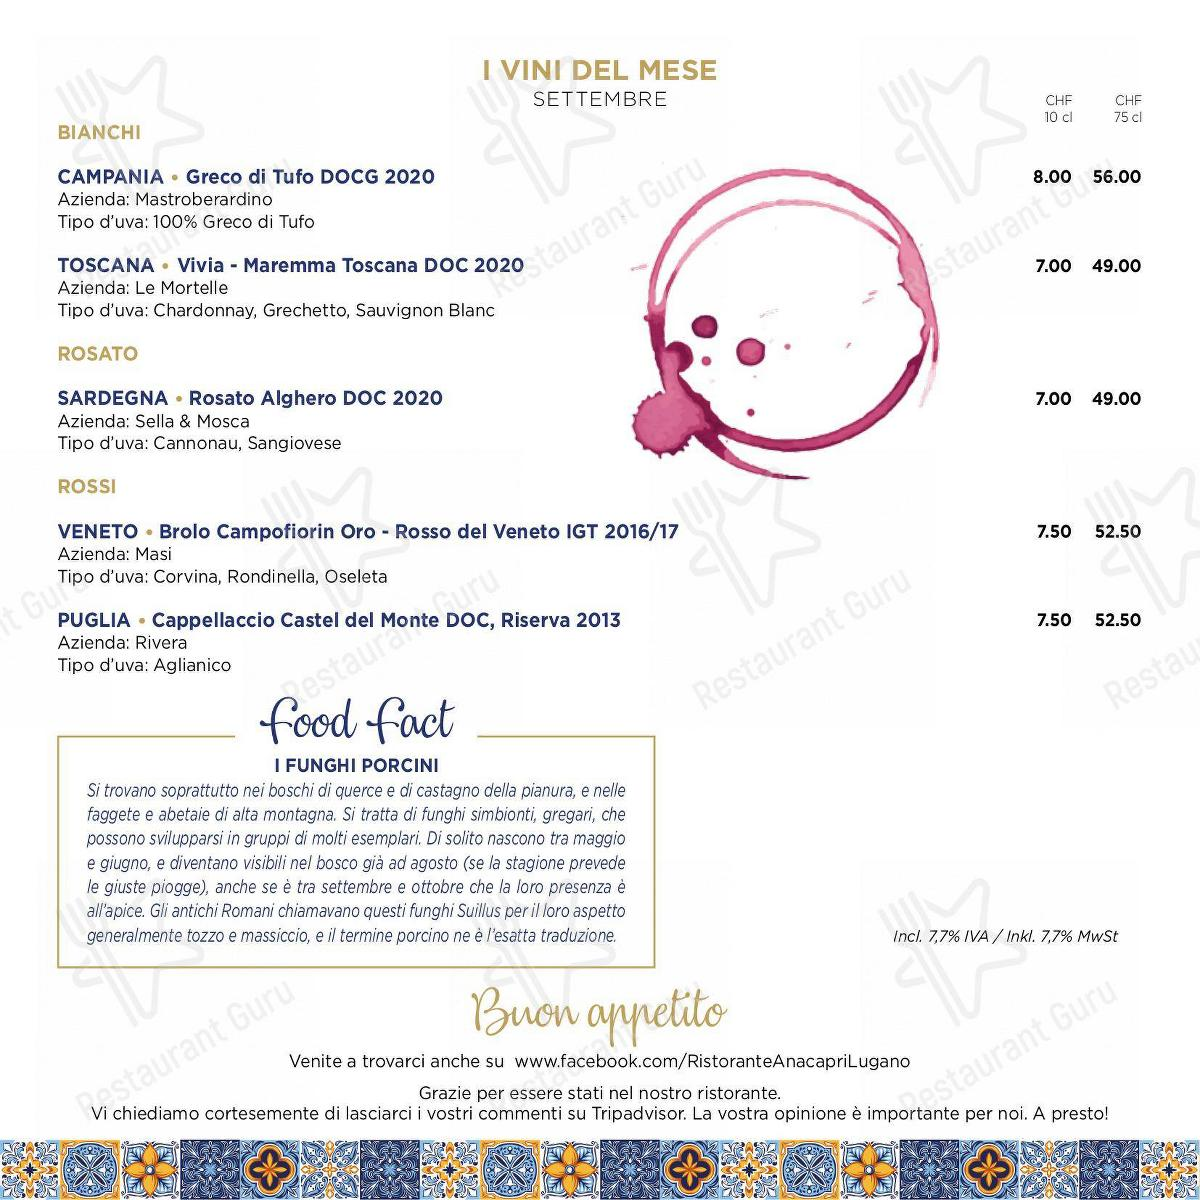 Speisekarte von Anacapri pizza